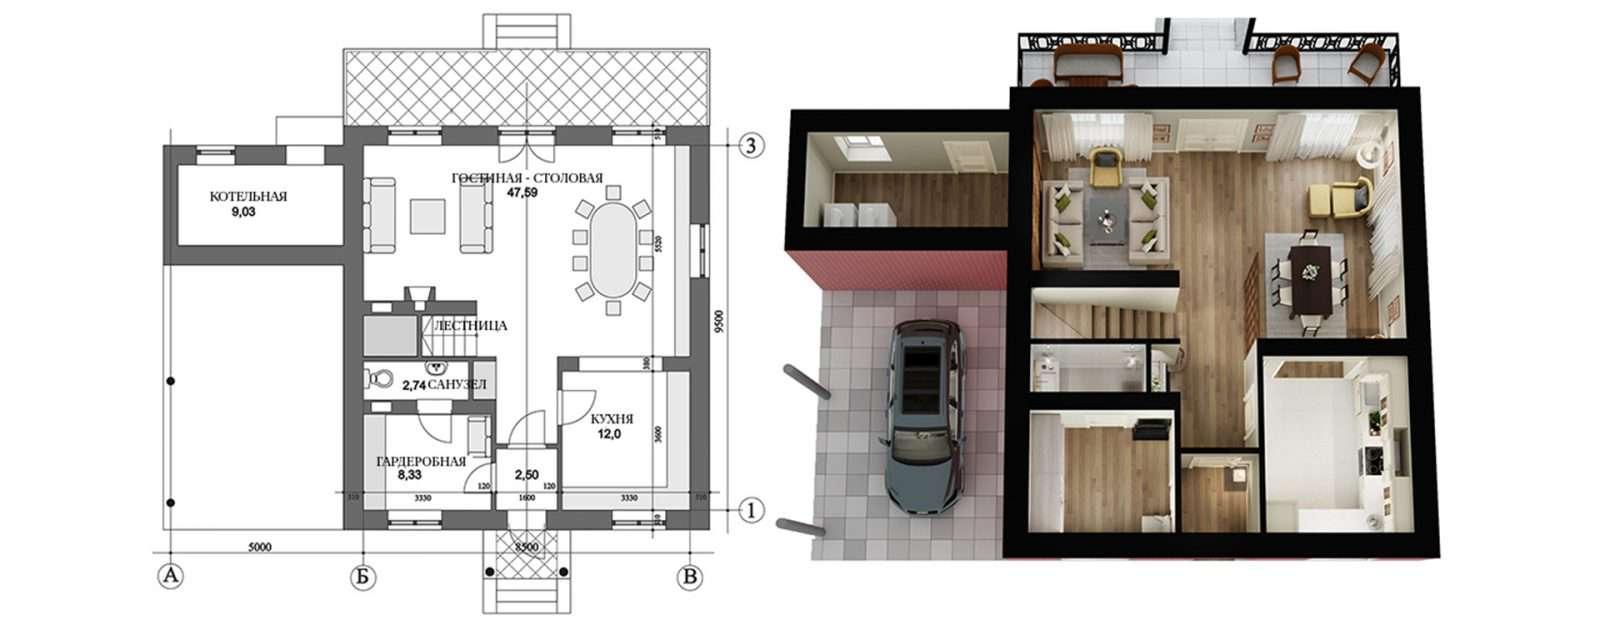 Коттедж «Агата» - план первого этажа